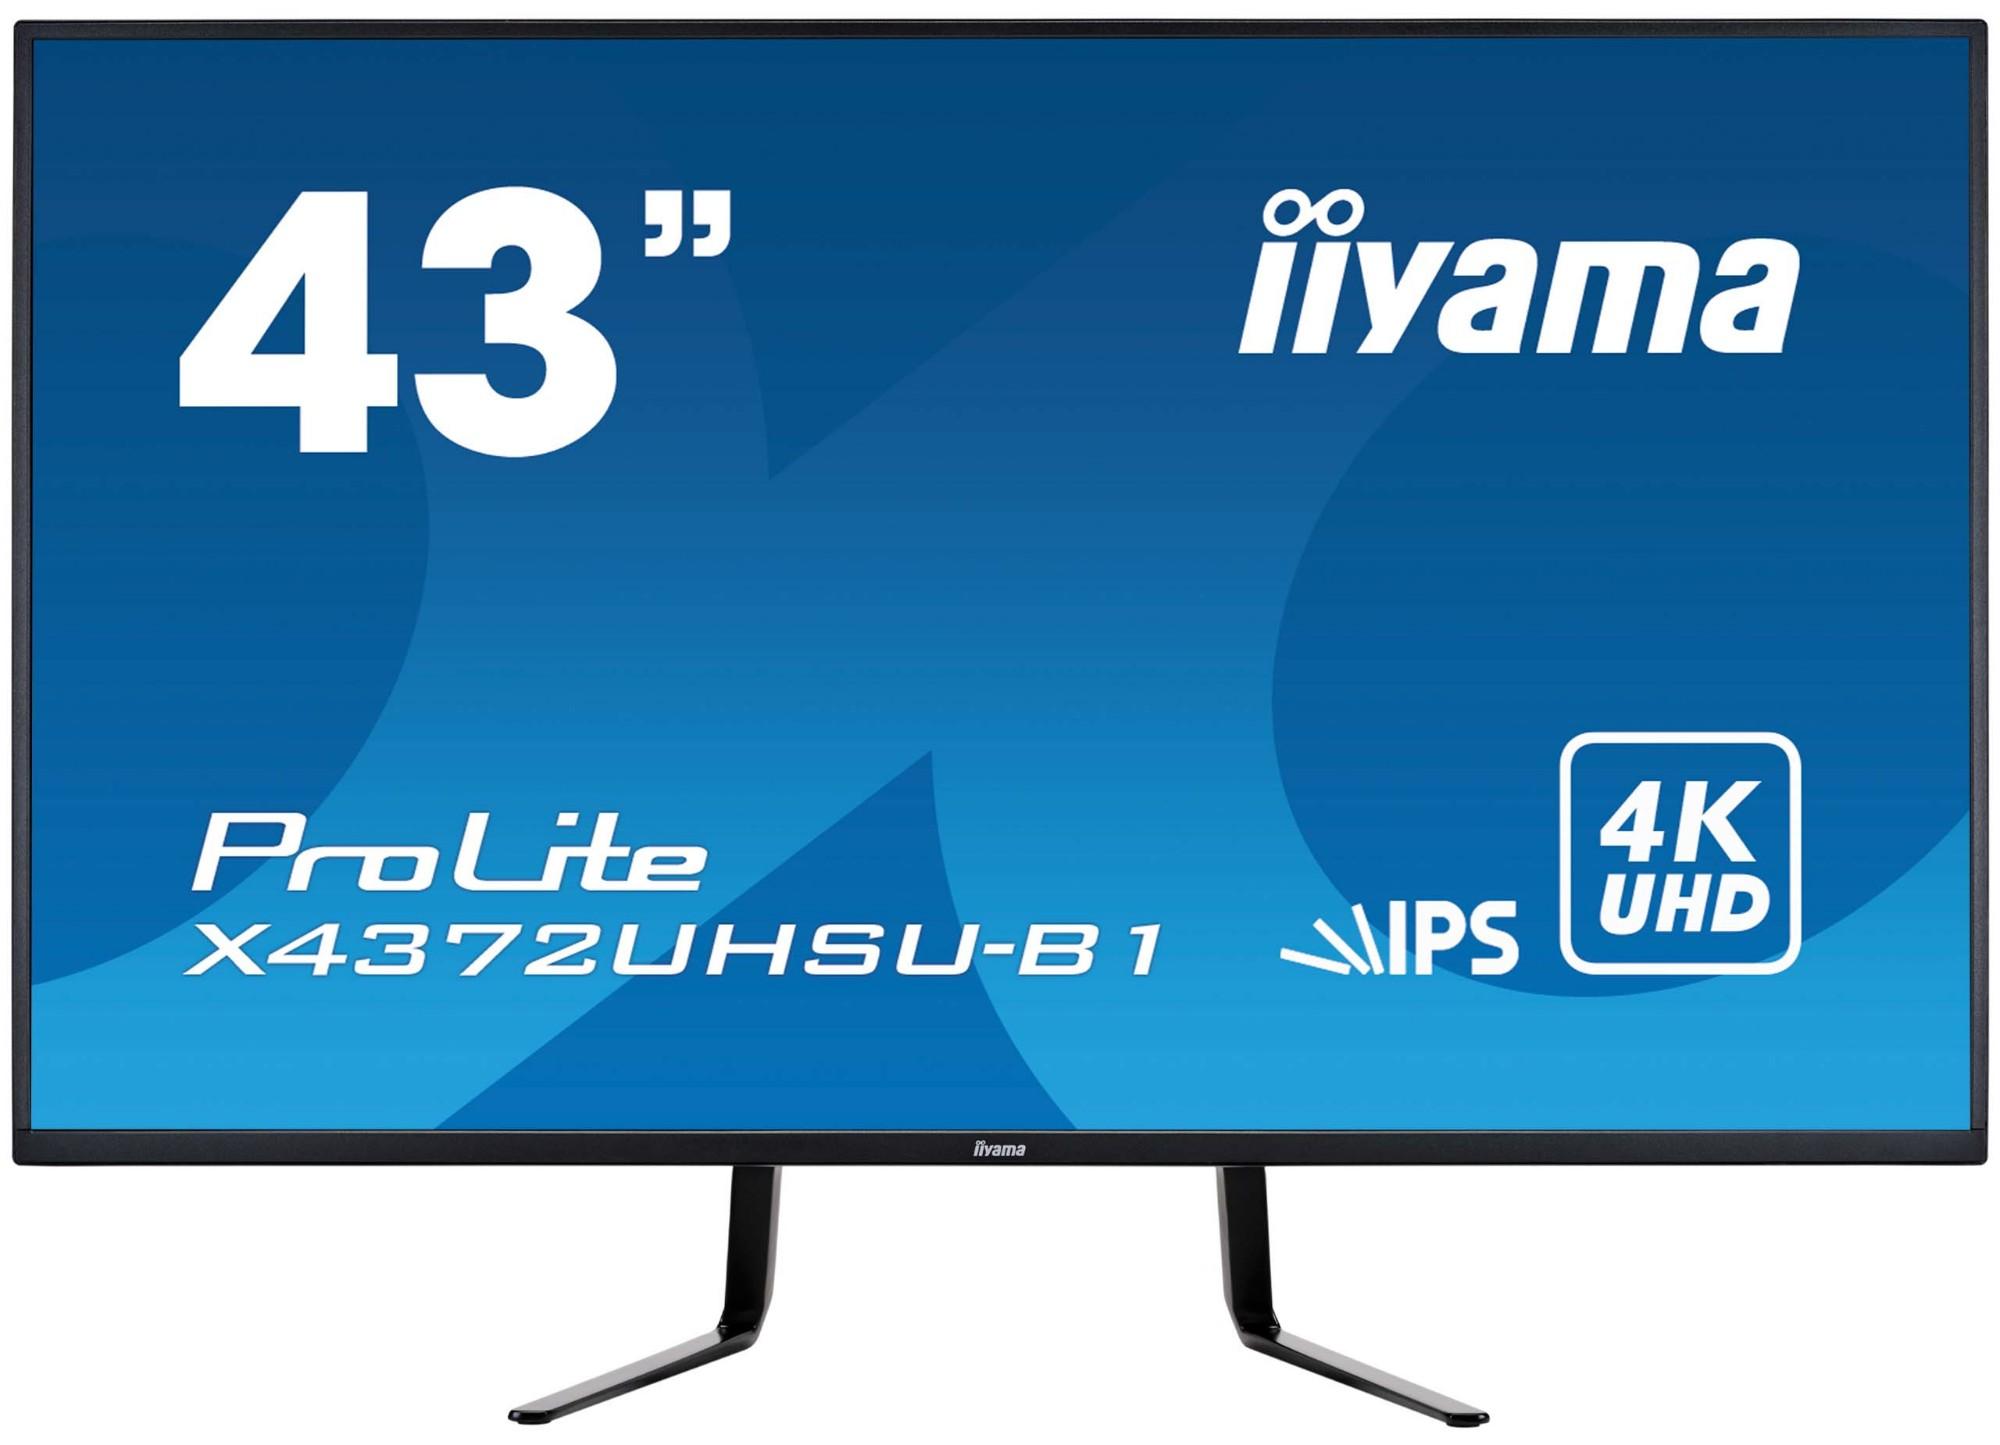 iiyama ProLite X4372UHSU-B1 computer monitor 108 cm 42.5